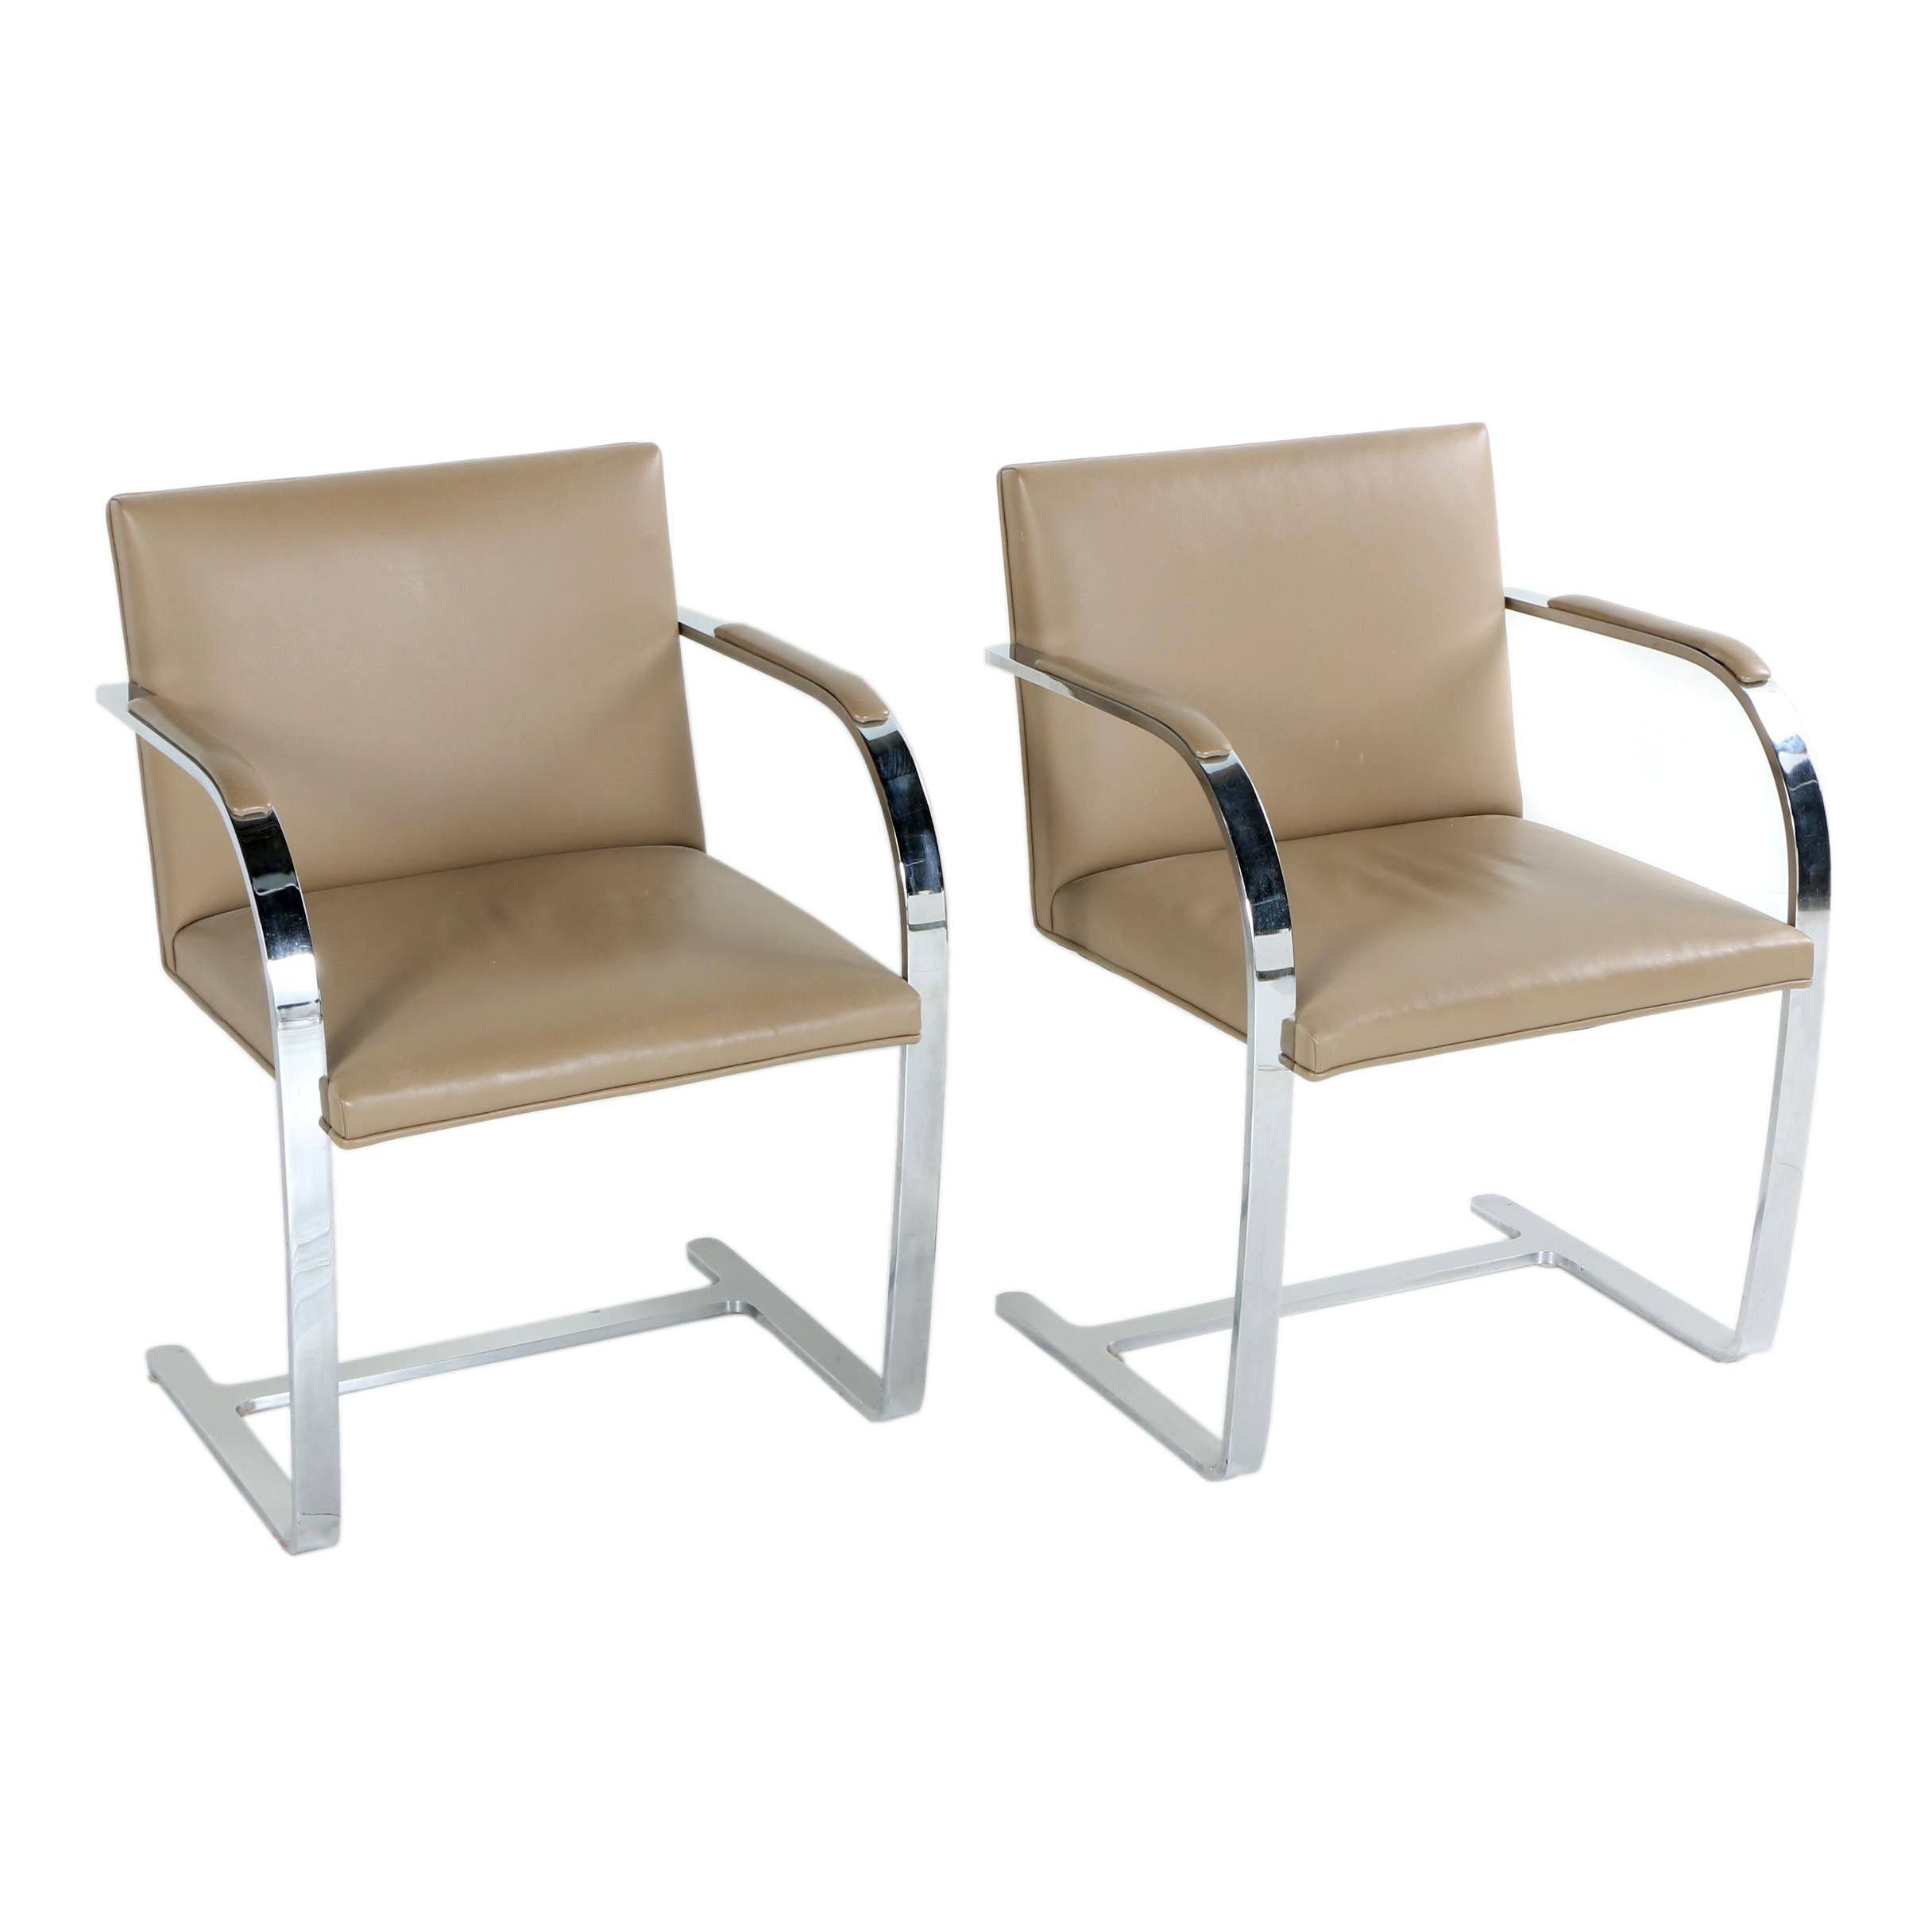 "Mid Century Modern ""Brno"" Style Chair Pair"